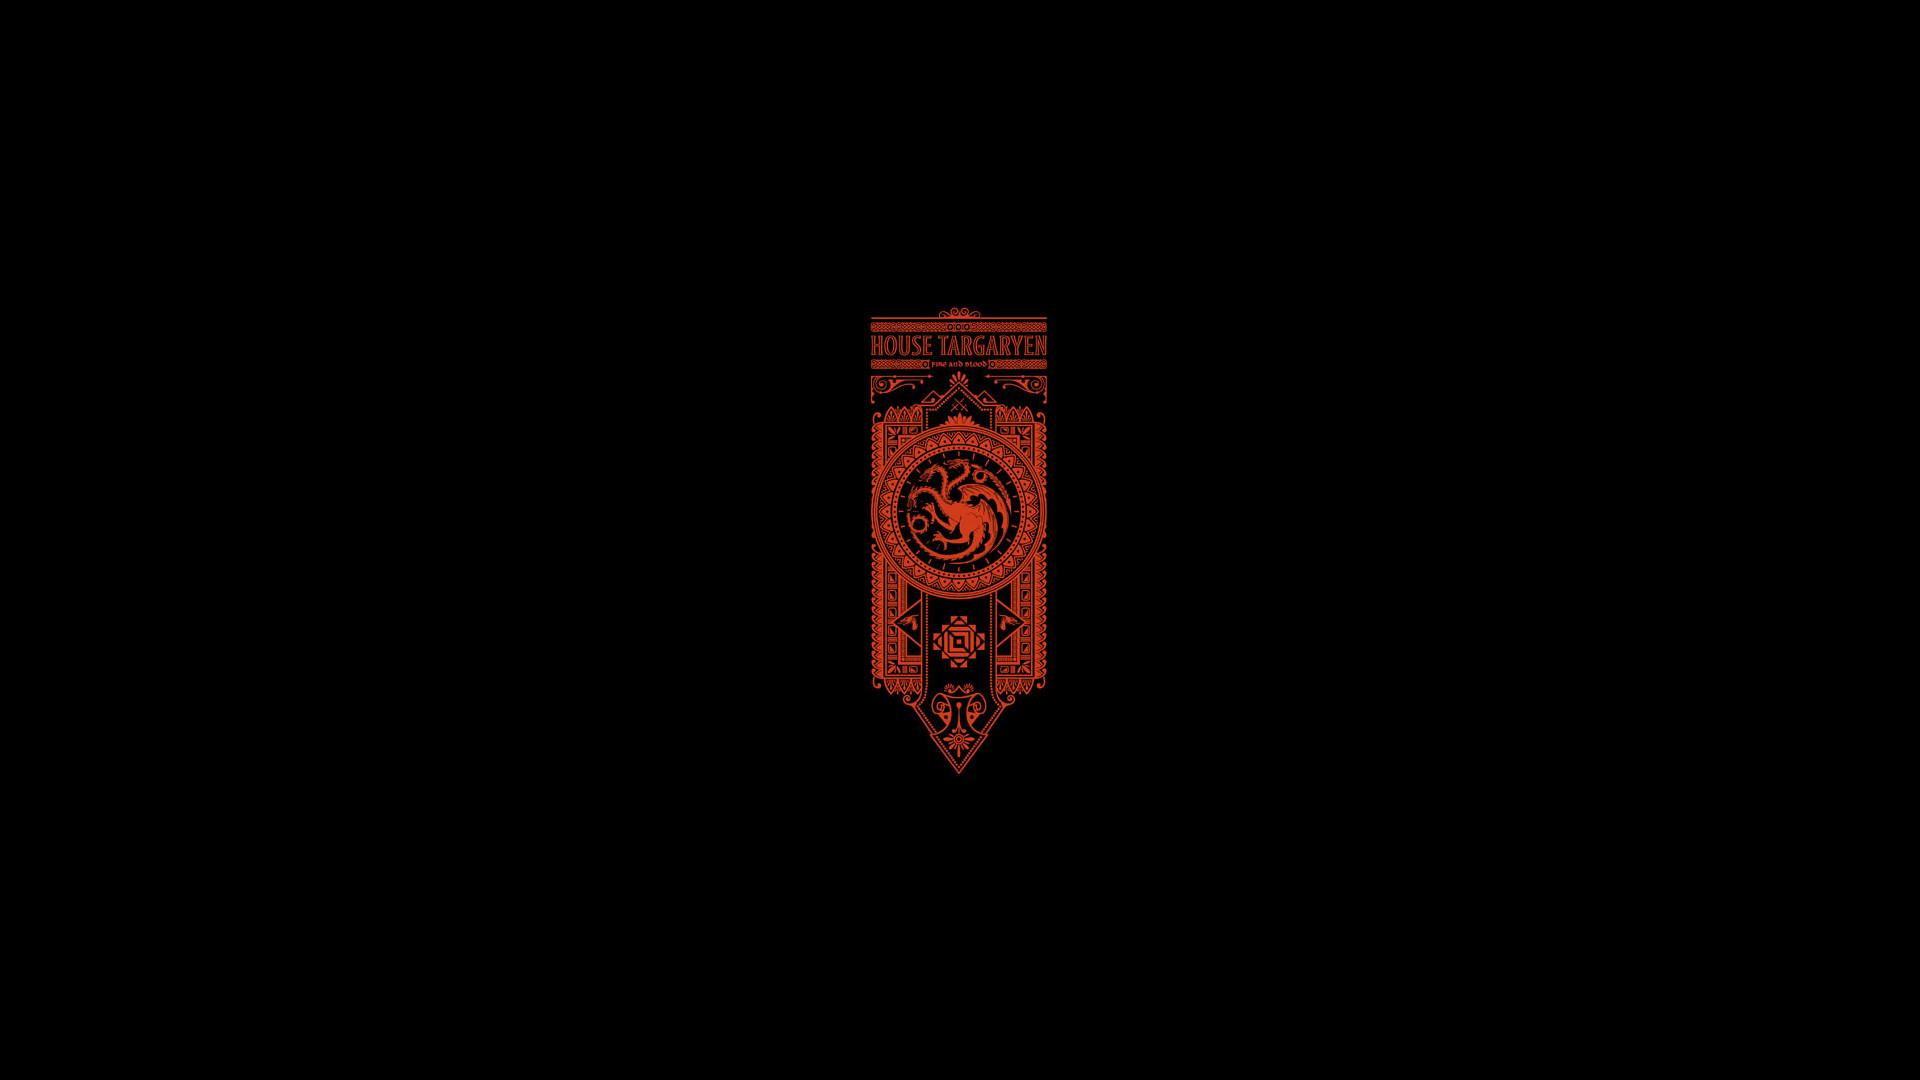 House Targaryen Game of Thrones 4k full hd iphone android wallpaper